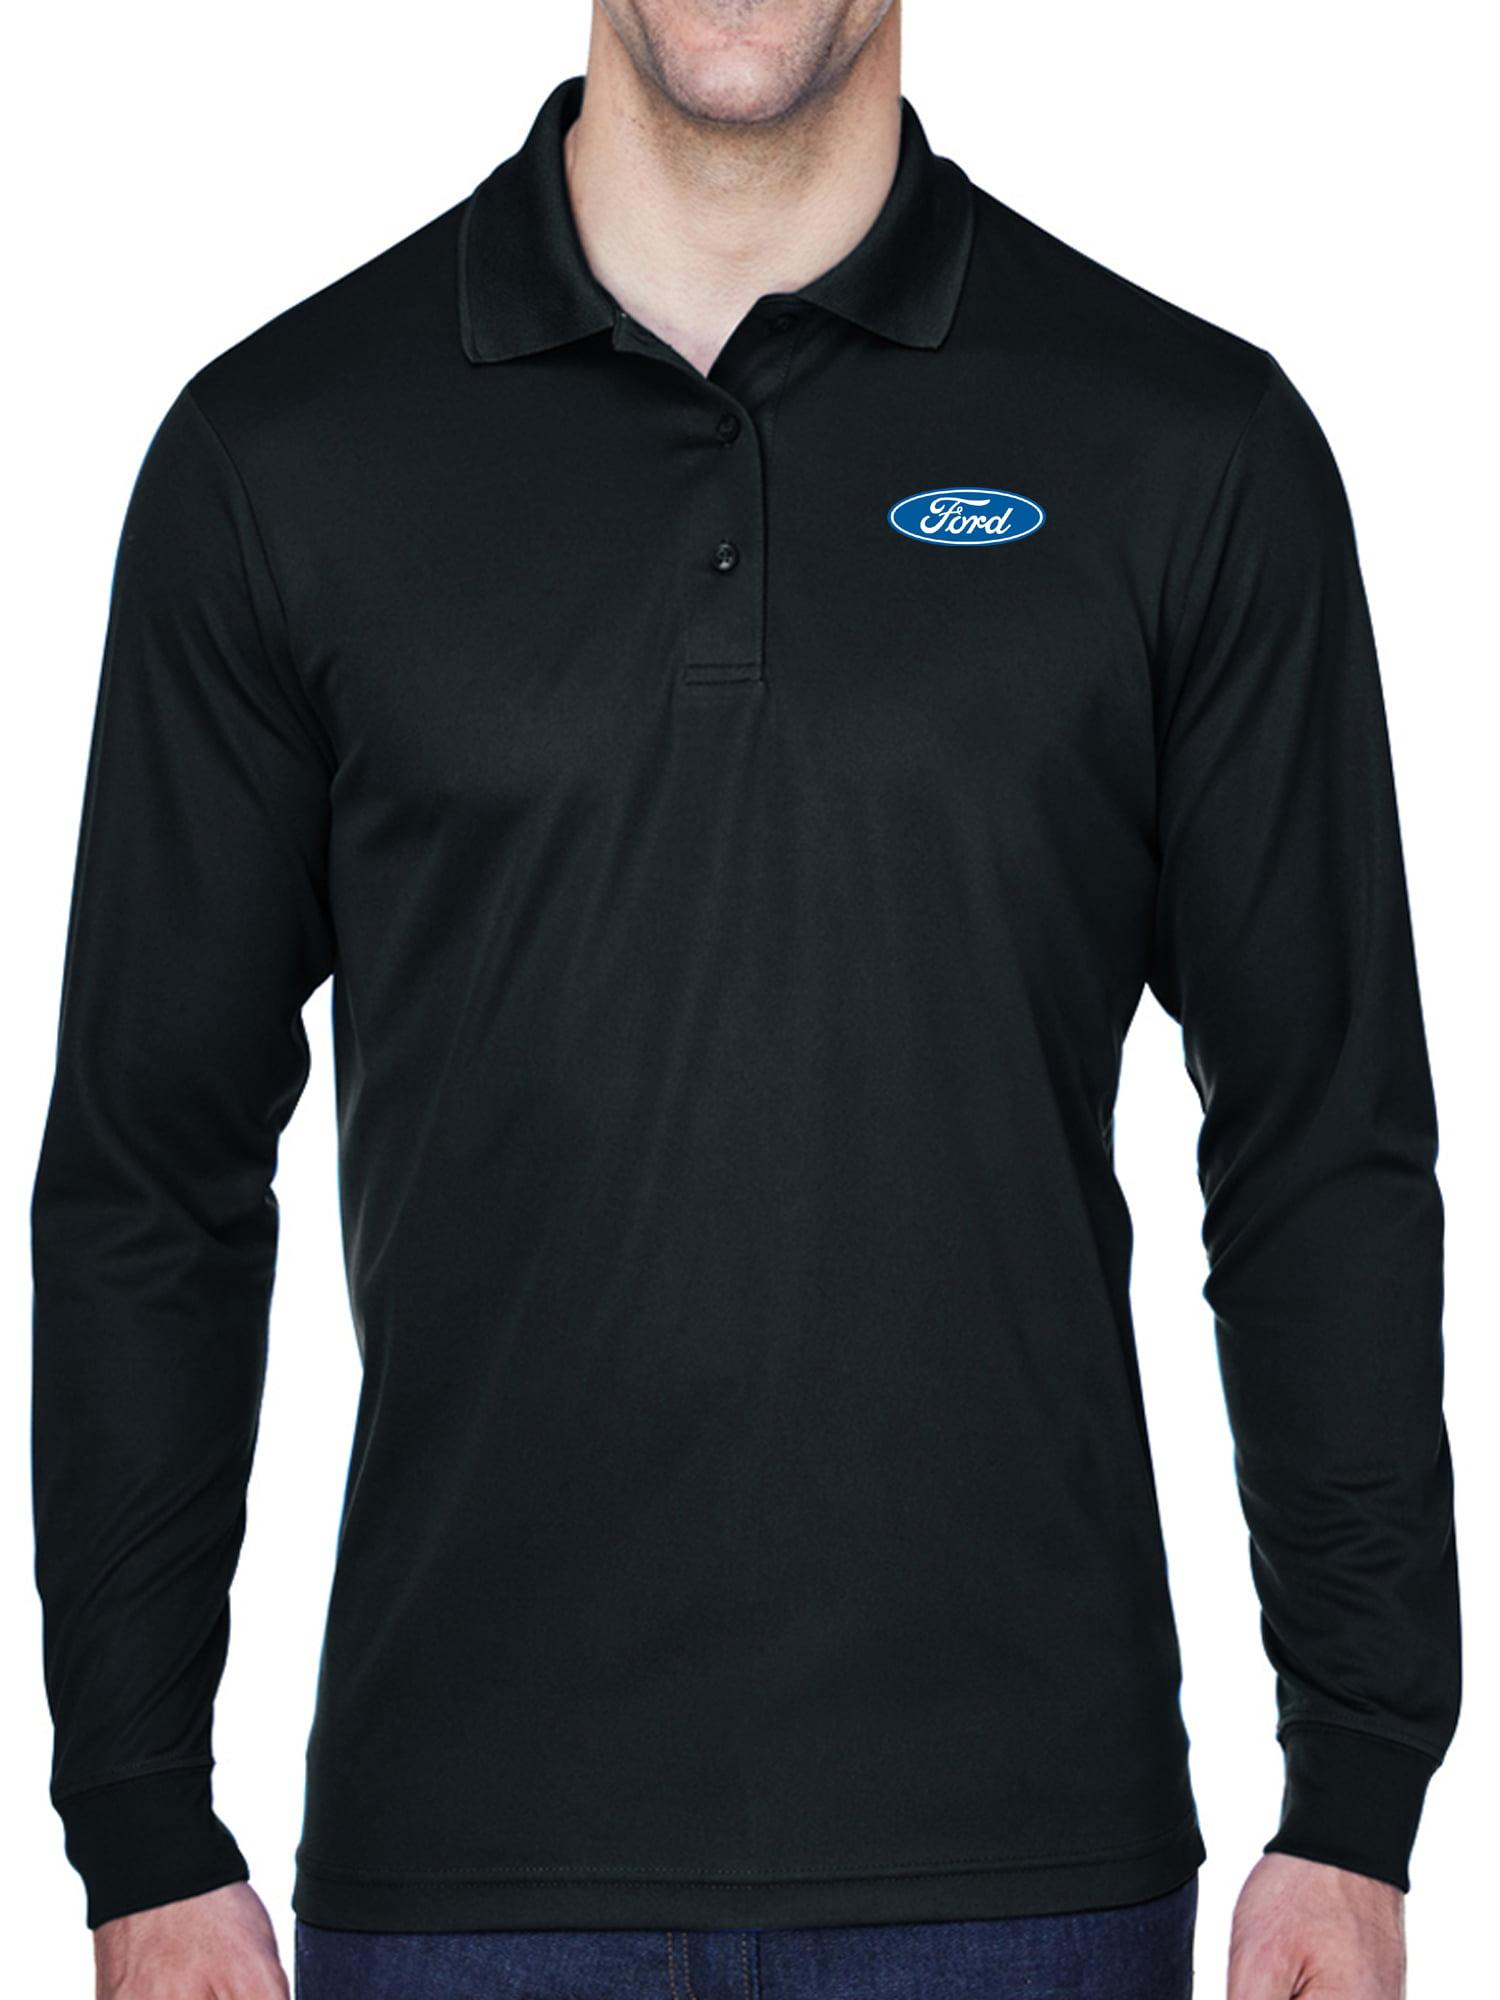 Buy Cool Shirts - Mens Ford Oval Logo Long Sleeve Polo Shirt - Black, 4XL - Walmart.com